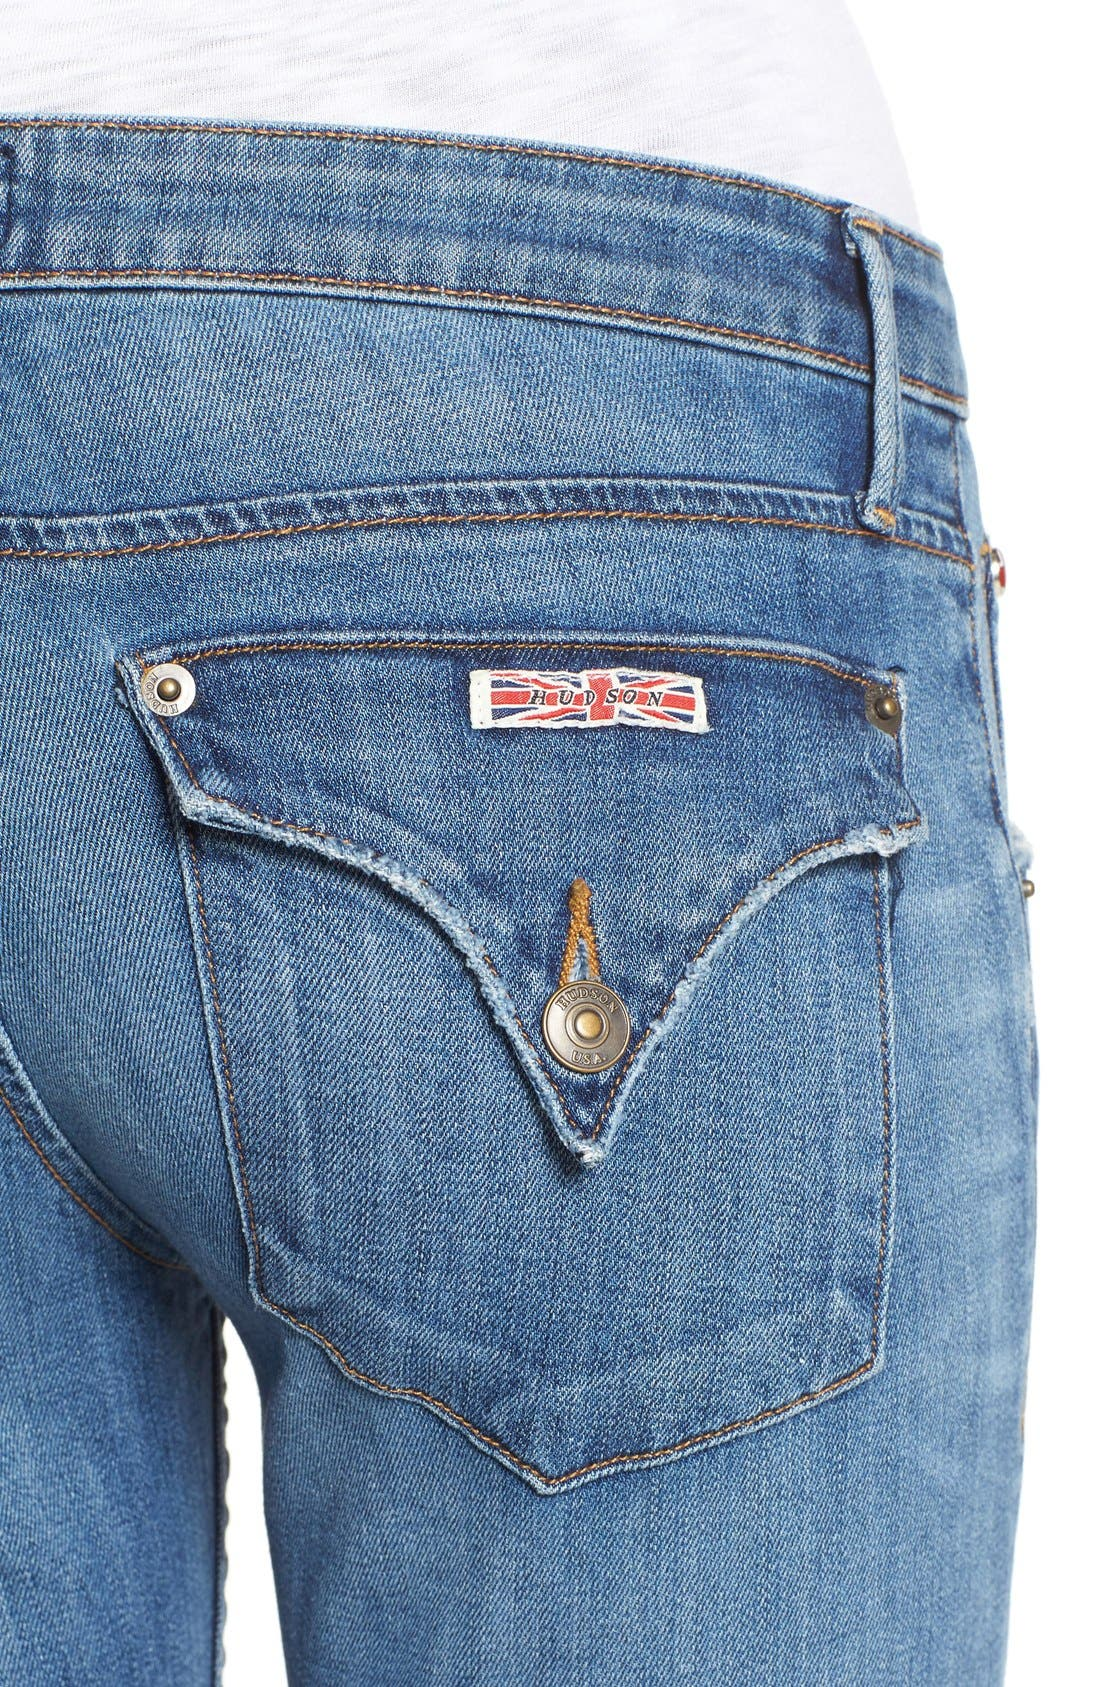 'Jax' Slim Boyfriend Jeans,                             Alternate thumbnail 4, color,                             Skip